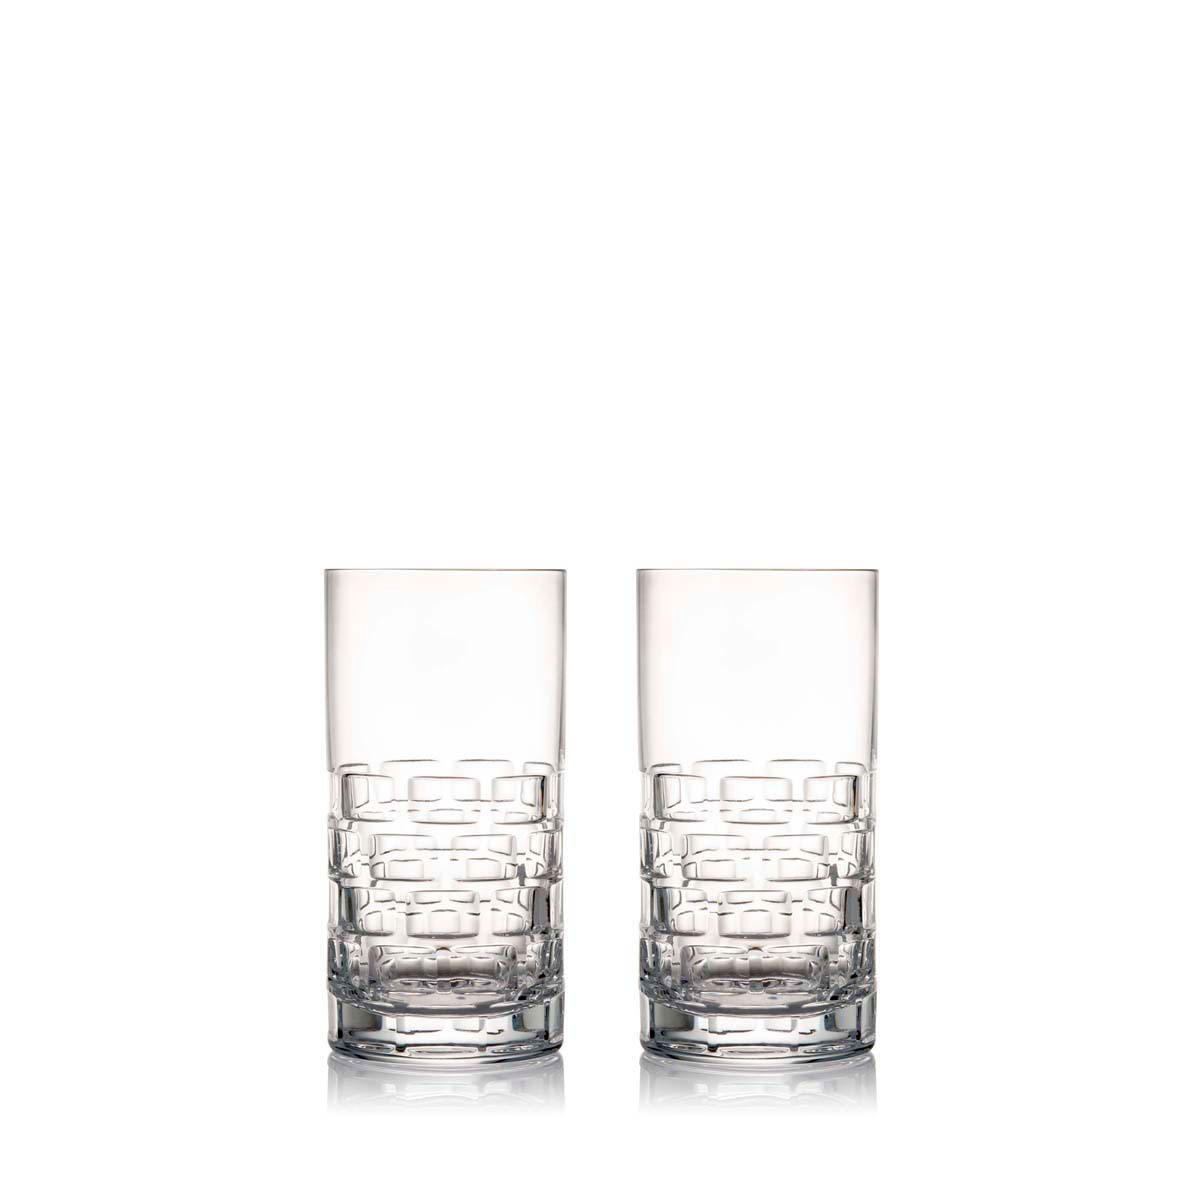 Rogaska Crystal, Maison Crystal Hiball, Pair